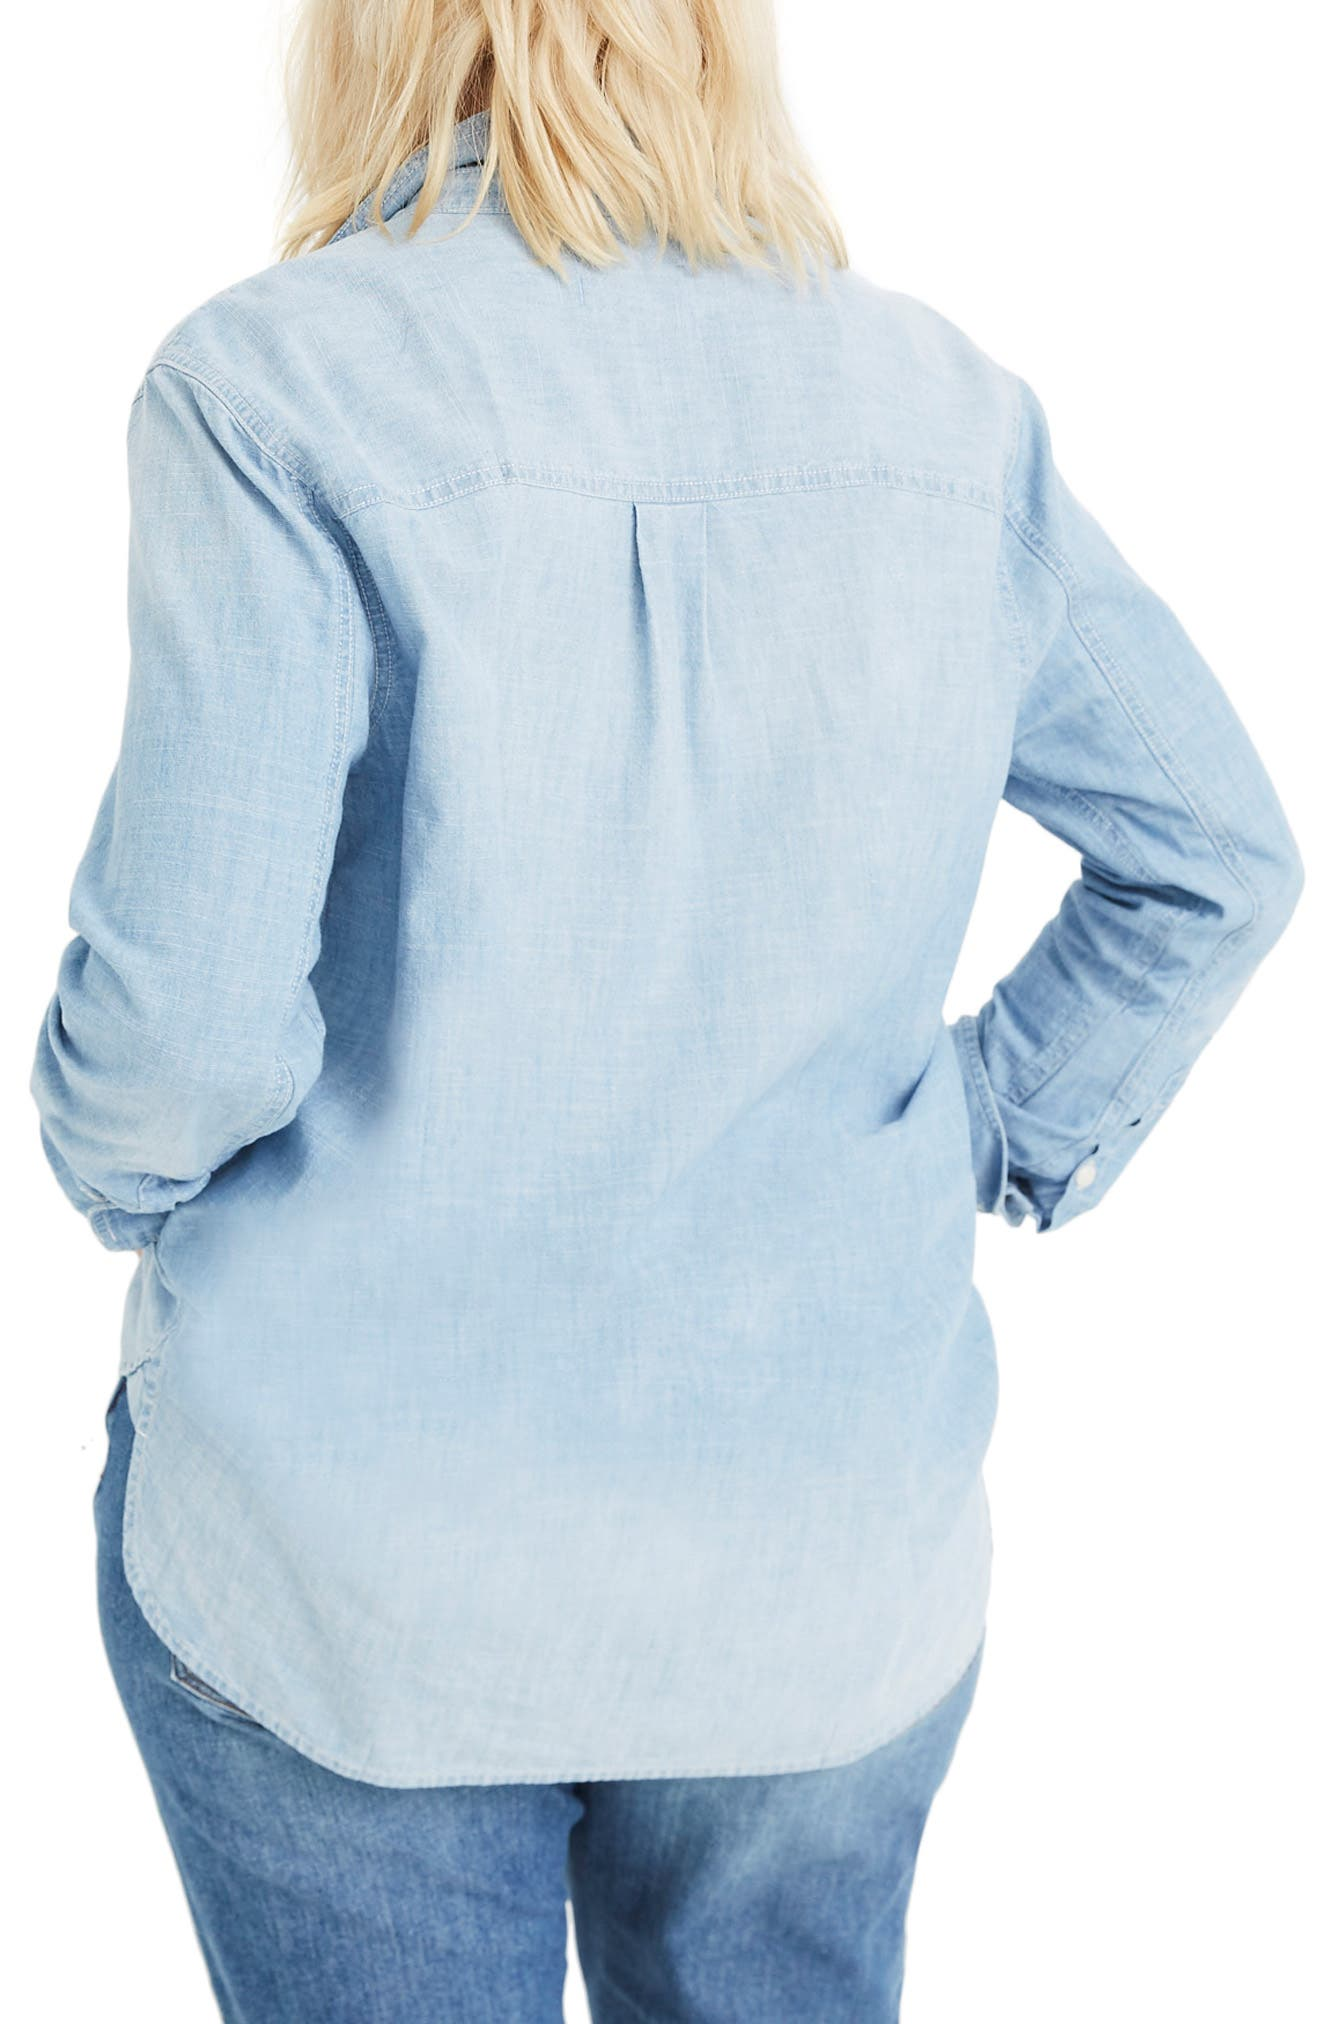 MADEWELL,                             Ex-Boyfriend Classic Chambray Shirt,                             Alternate thumbnail 2, color,                             EVIE WASH